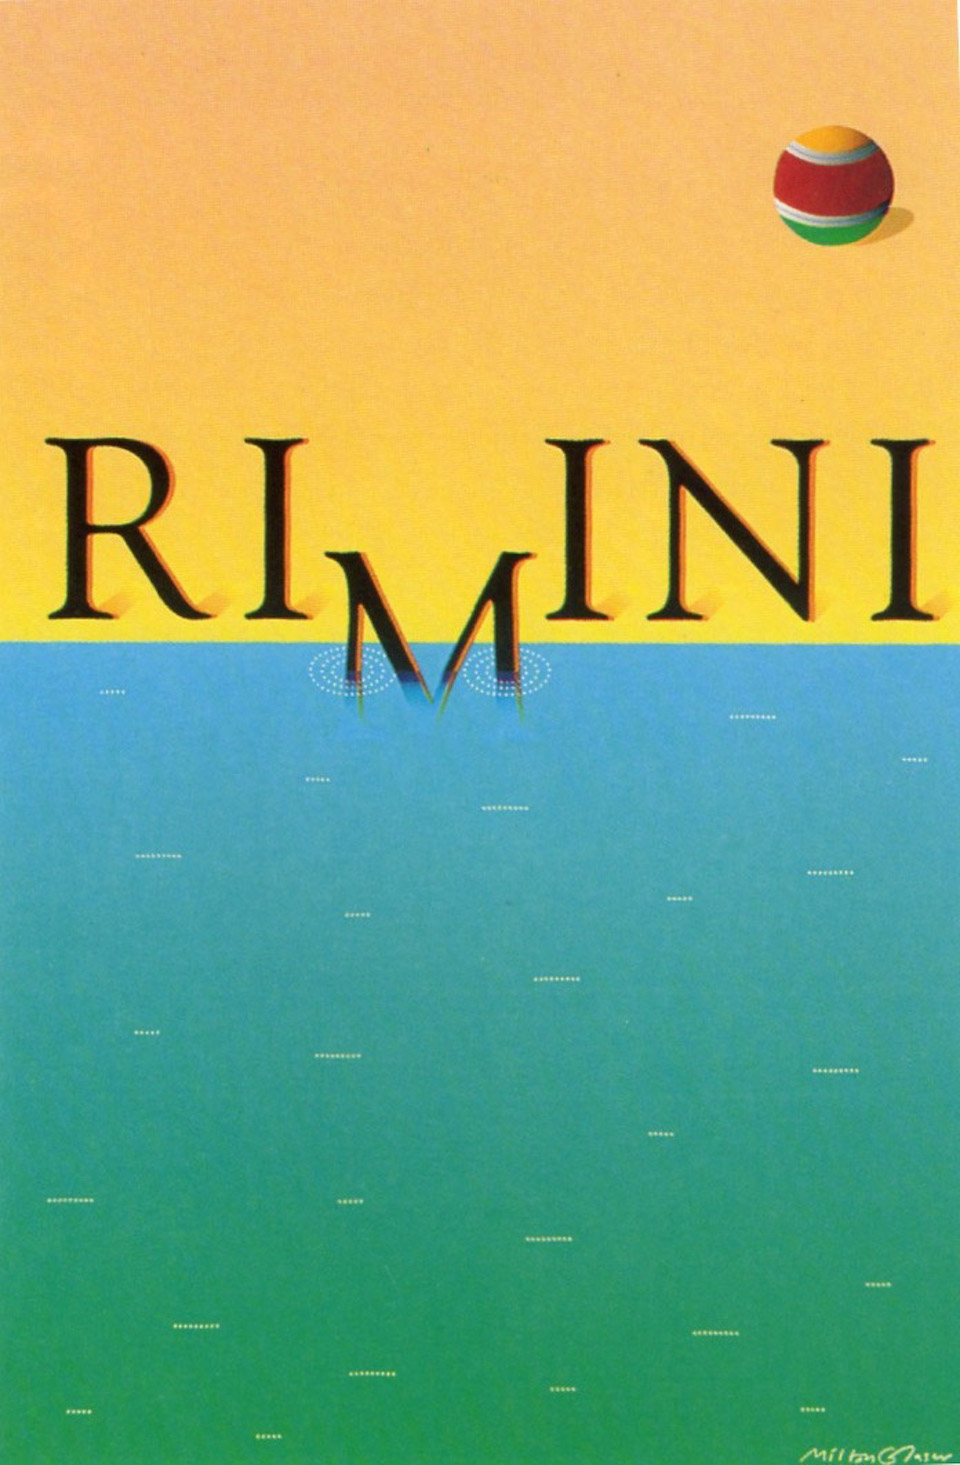 1995-milton-glaser